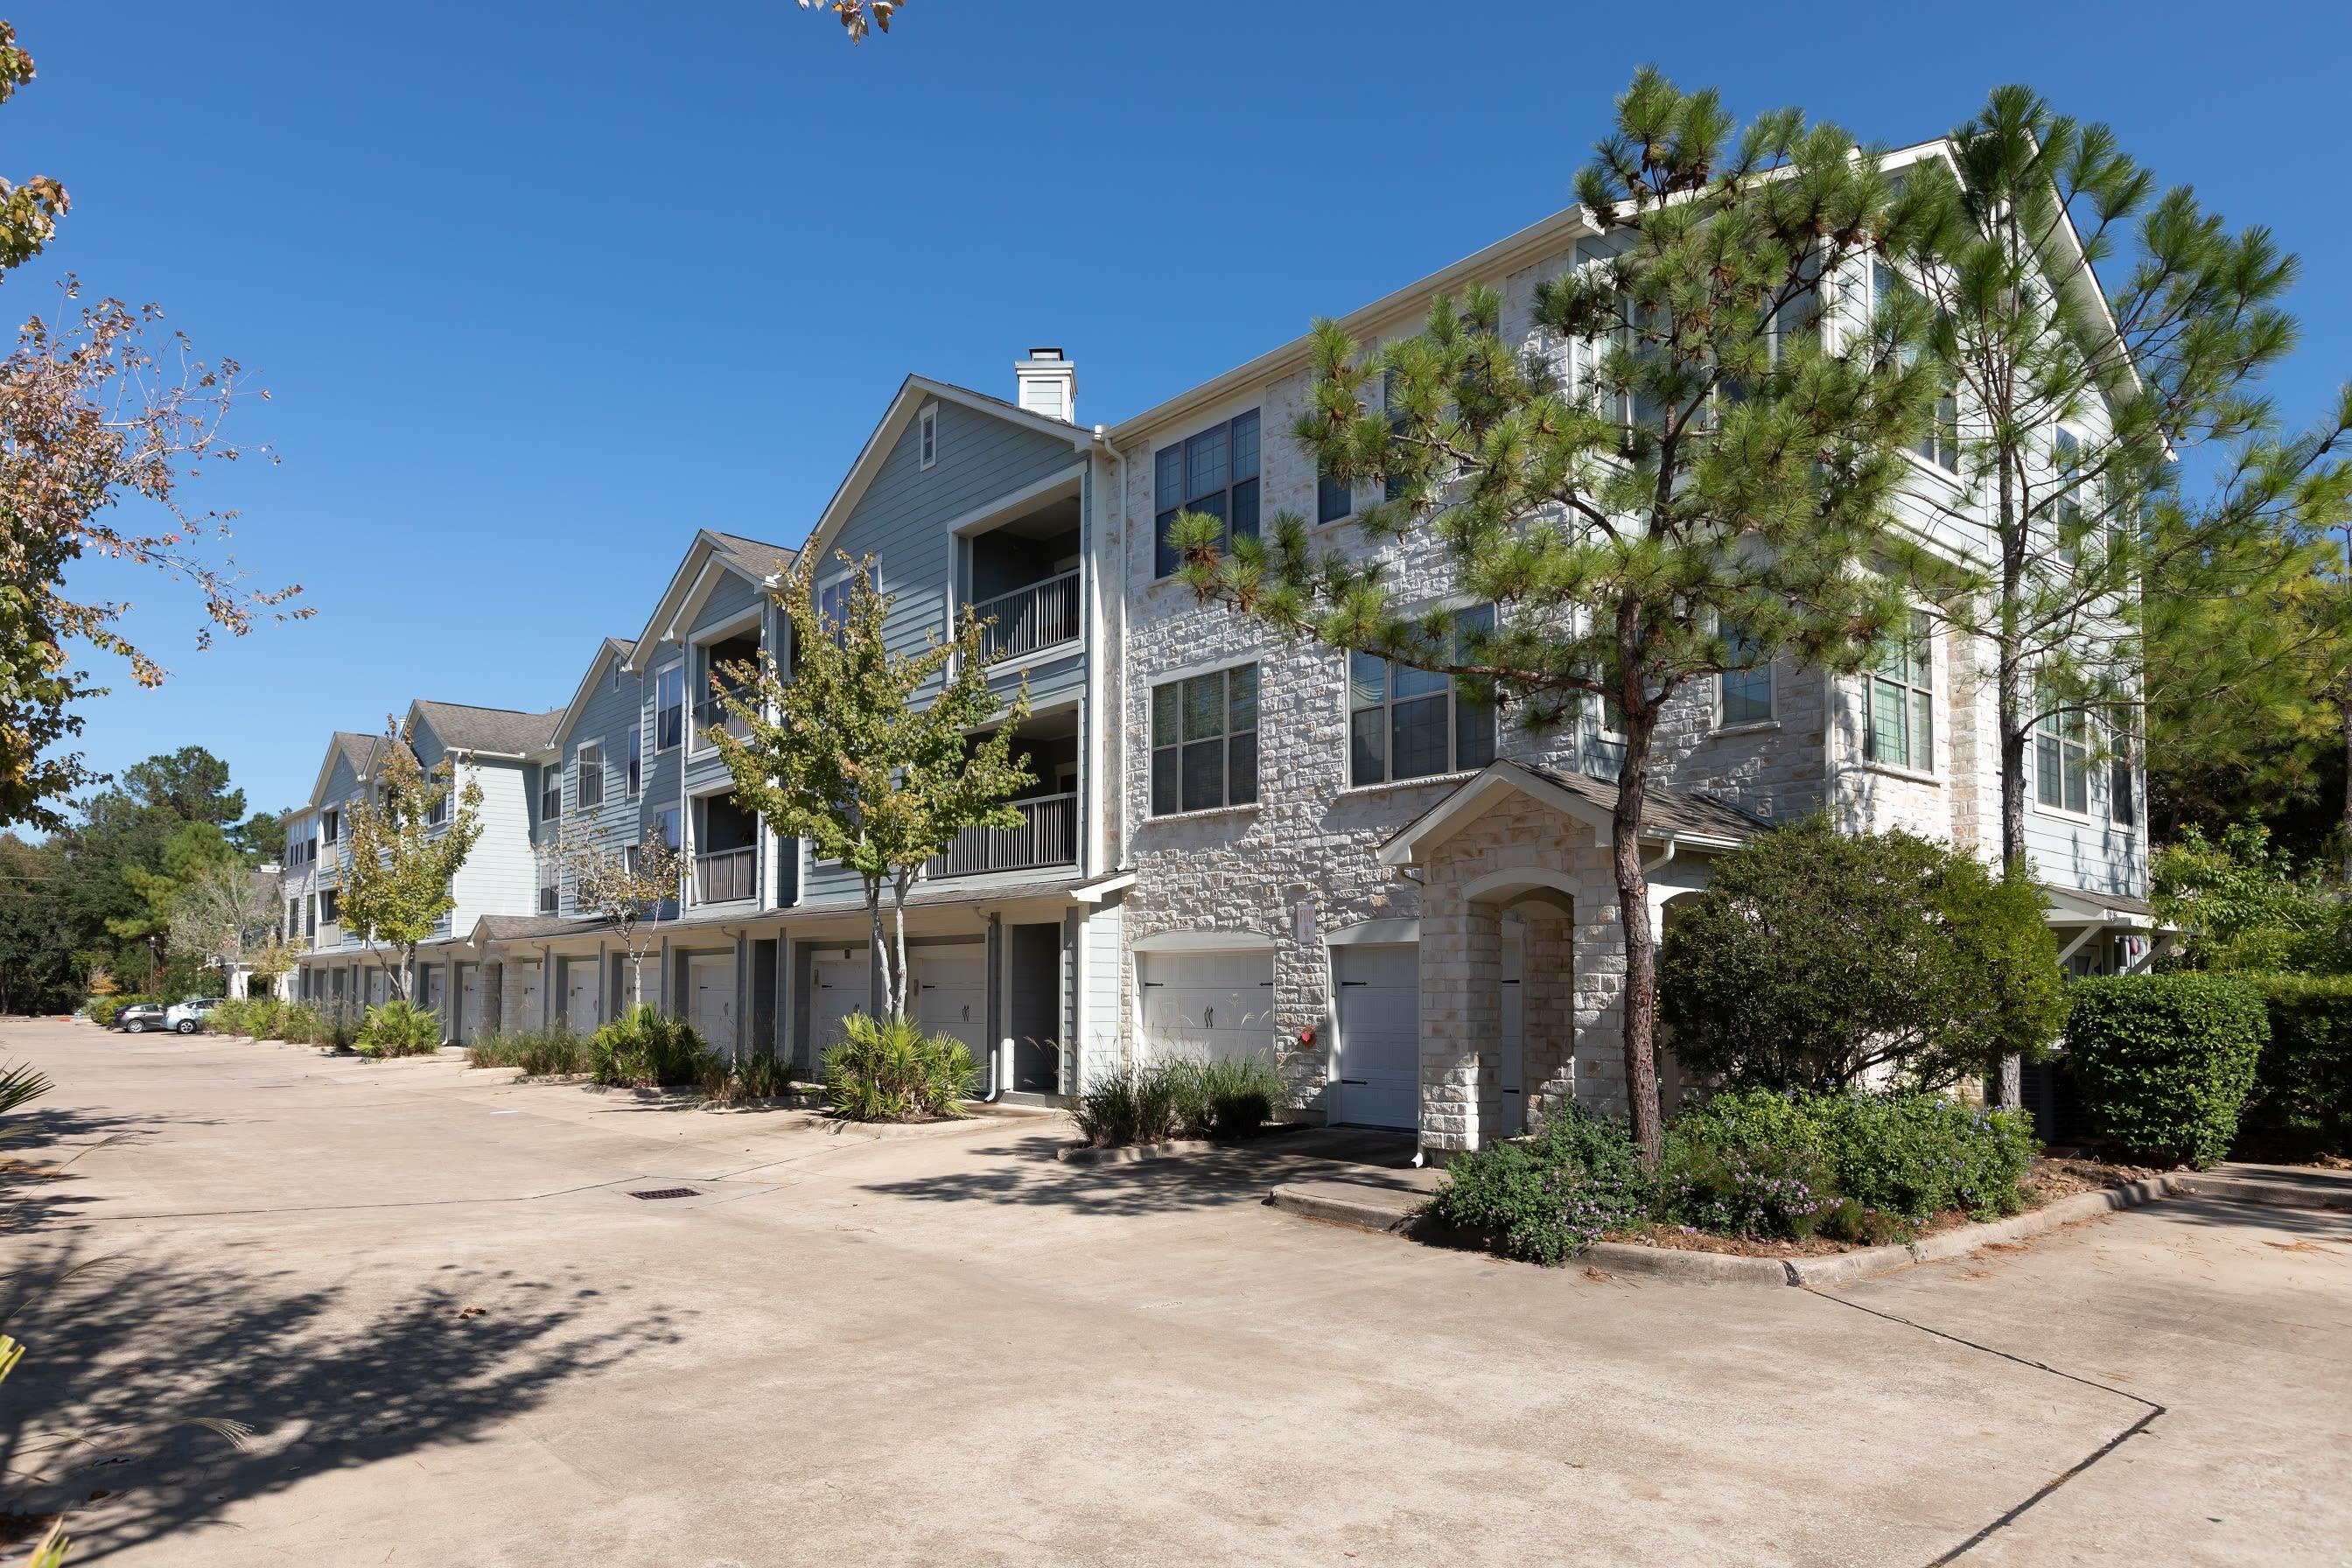 Exterior view of Lakefront Villas in Houston, Texas